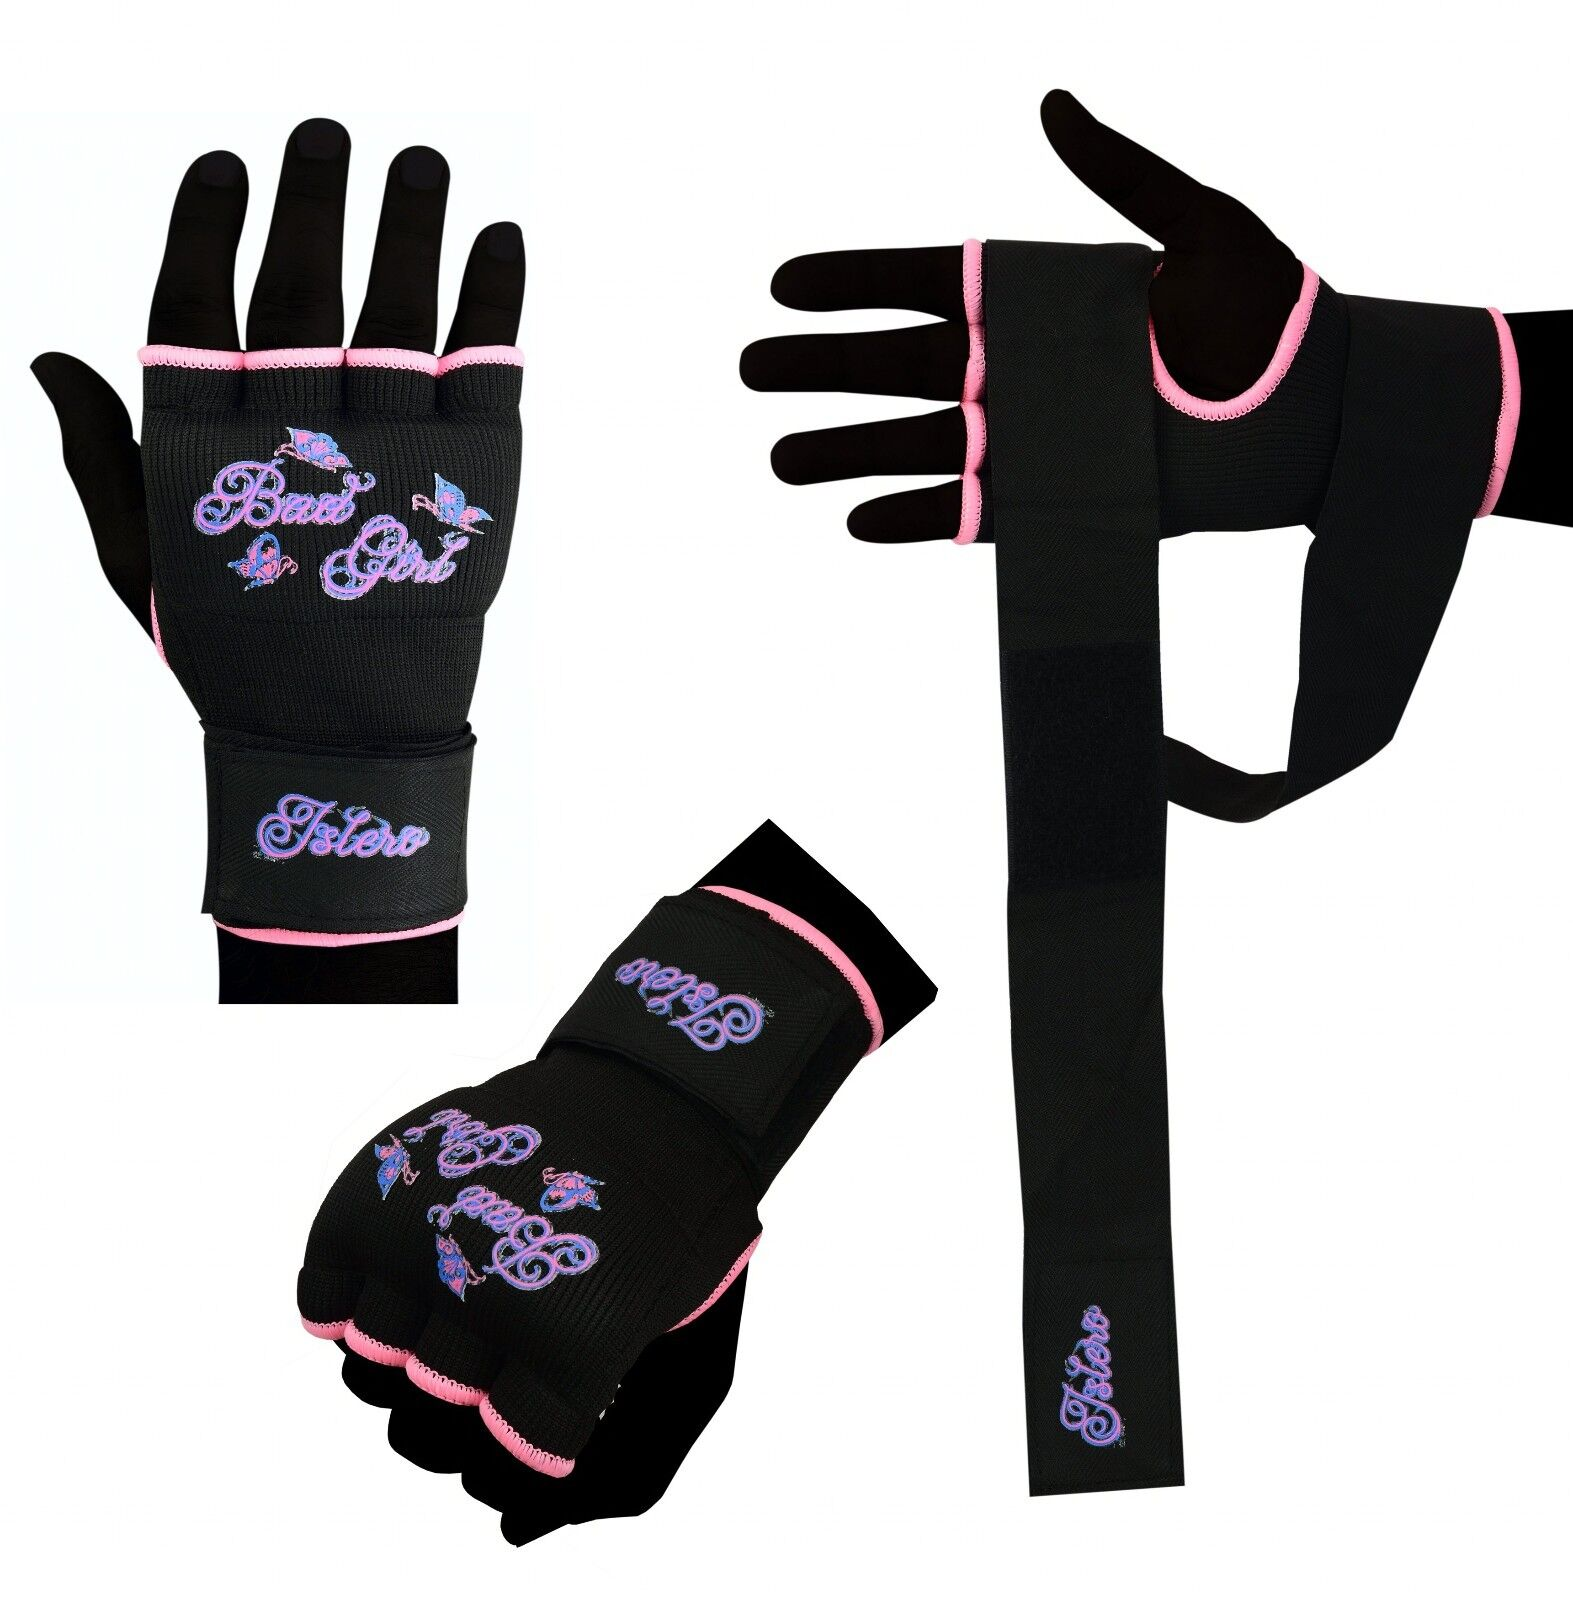 Geschäft Outlet zum Verkauf bester Platz Details zu Islero Damen Rosa Gel Handschuhe Mma Kickboxen Muay Thai  Kampfsport Handschützer